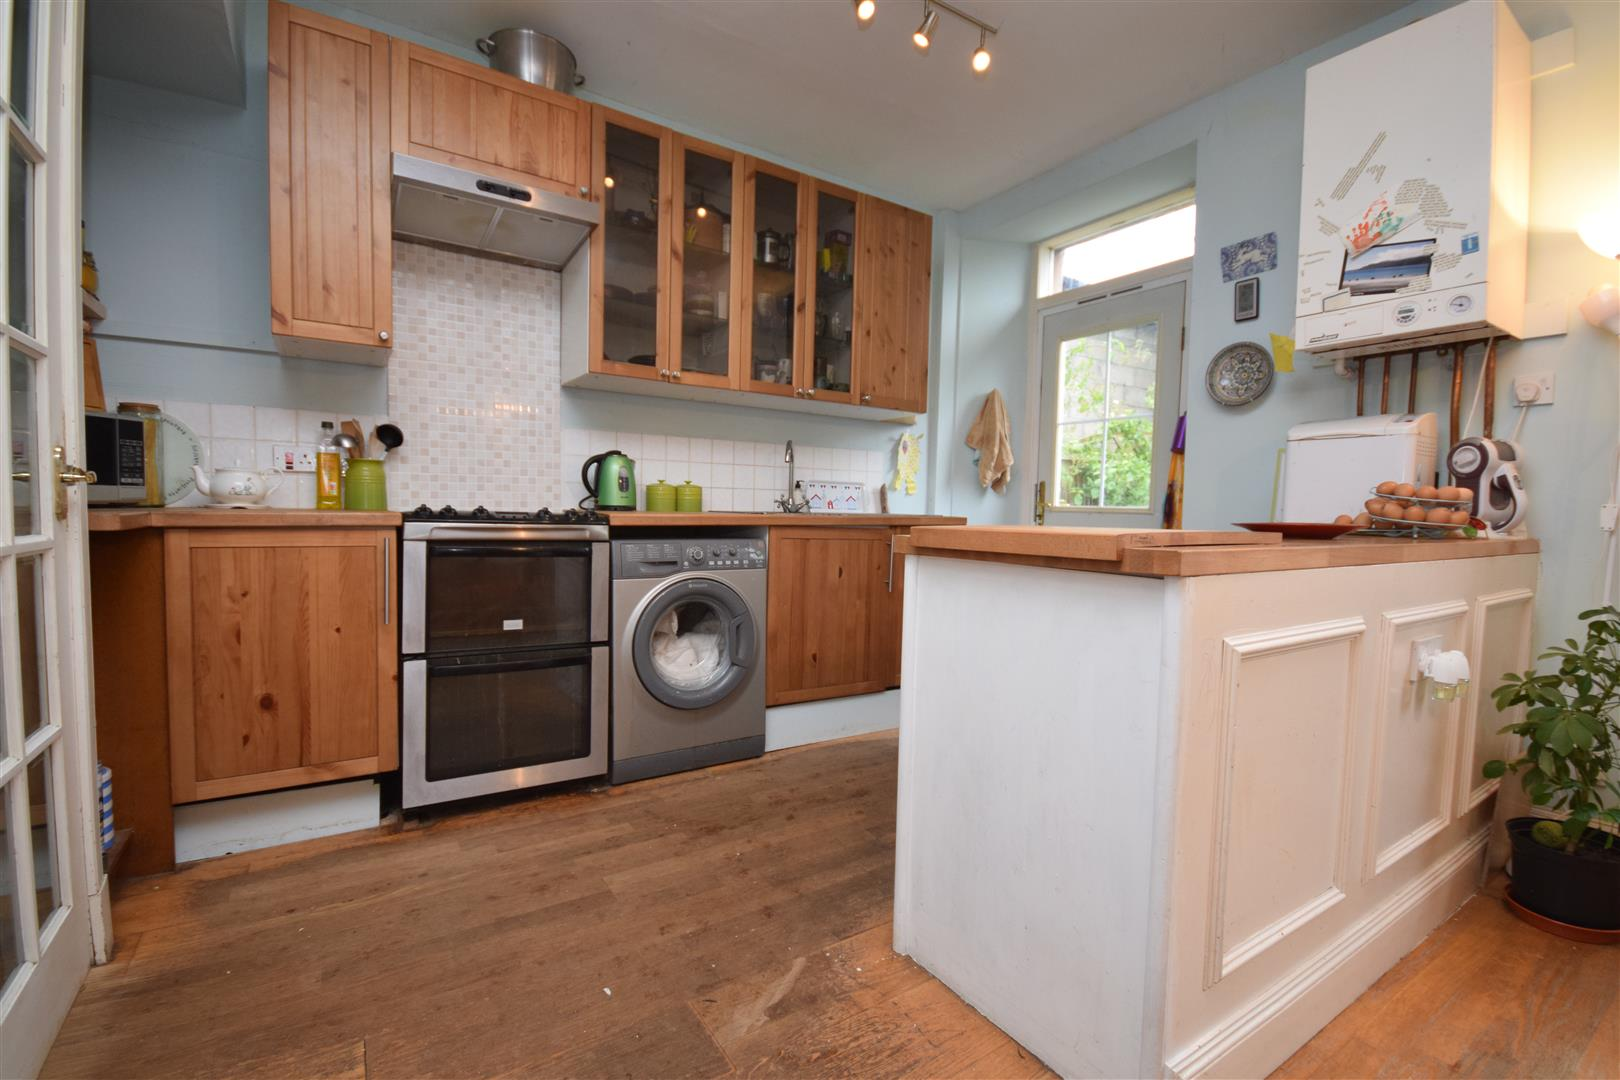 Balmoral Cottage, Duchlage Road, Crieff, Perthshire, PH7 3AZ, UK